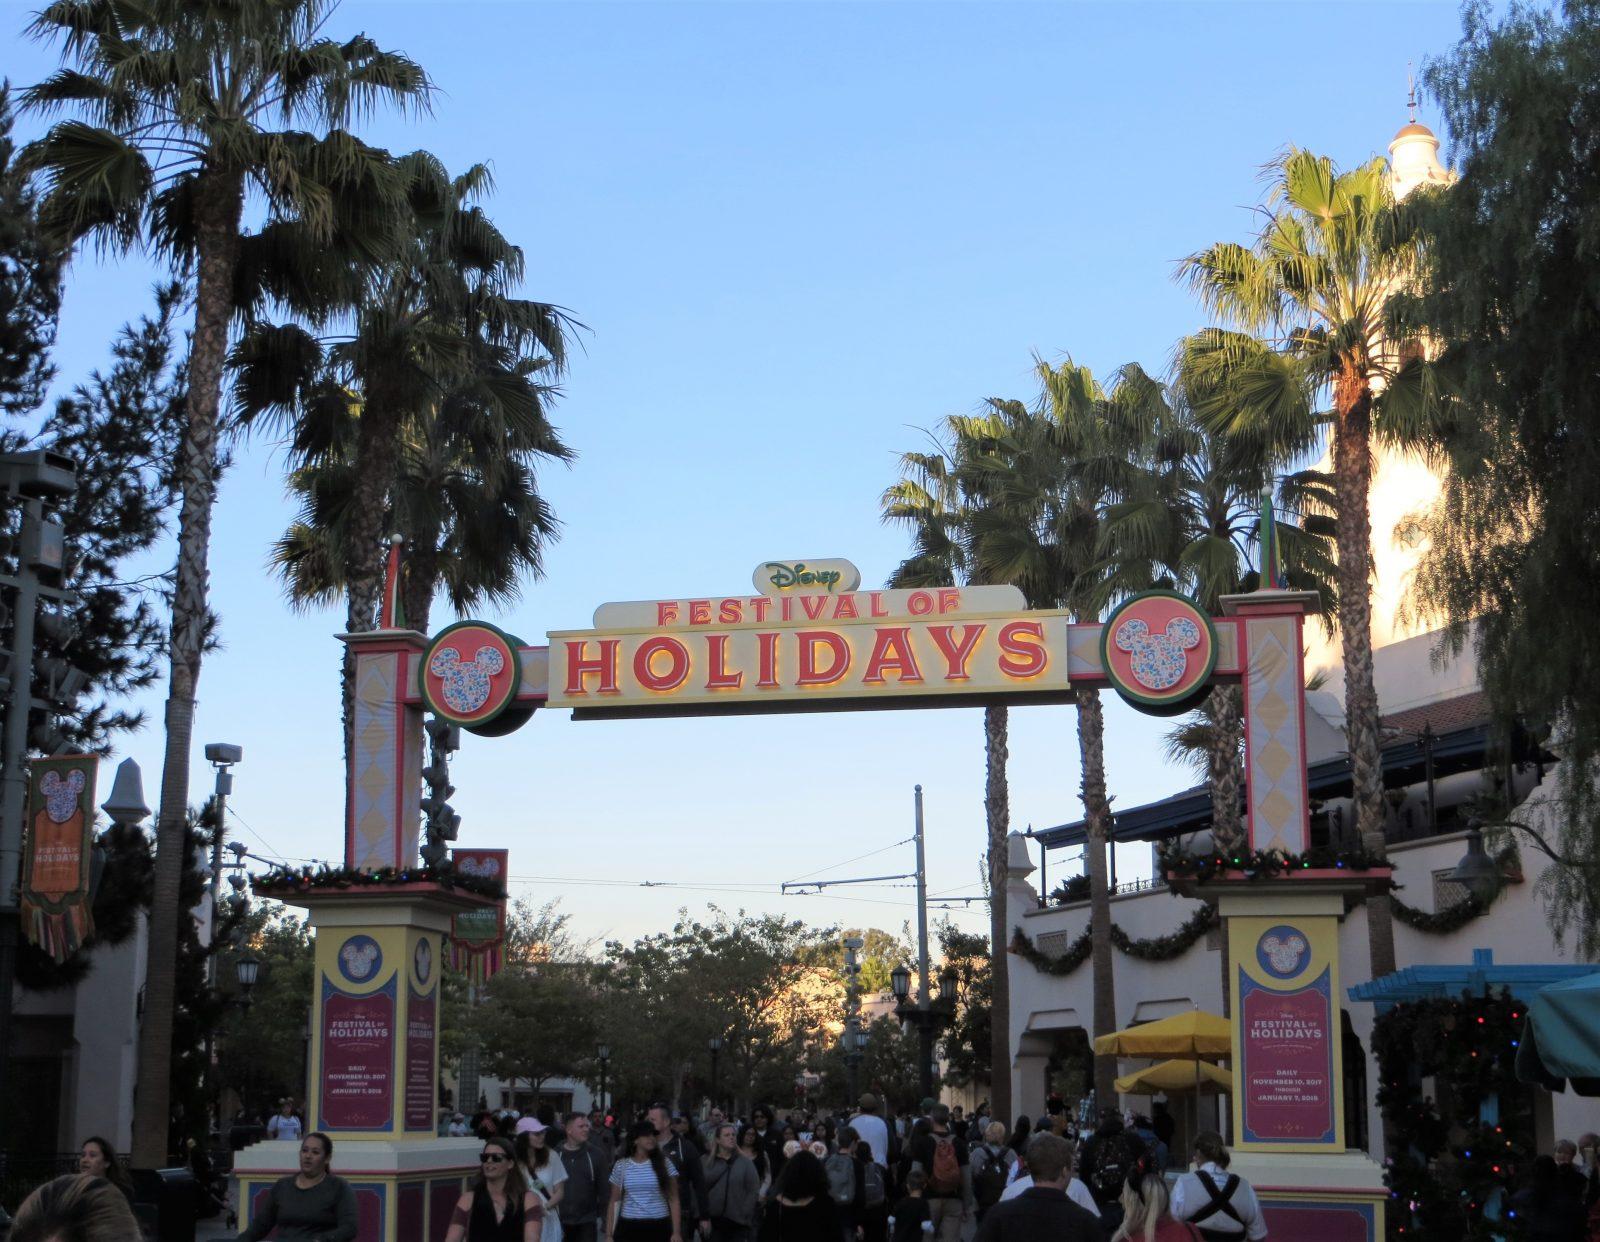 Visiting as a Vegan-Vegetarian at Disney's Festival of Holidays